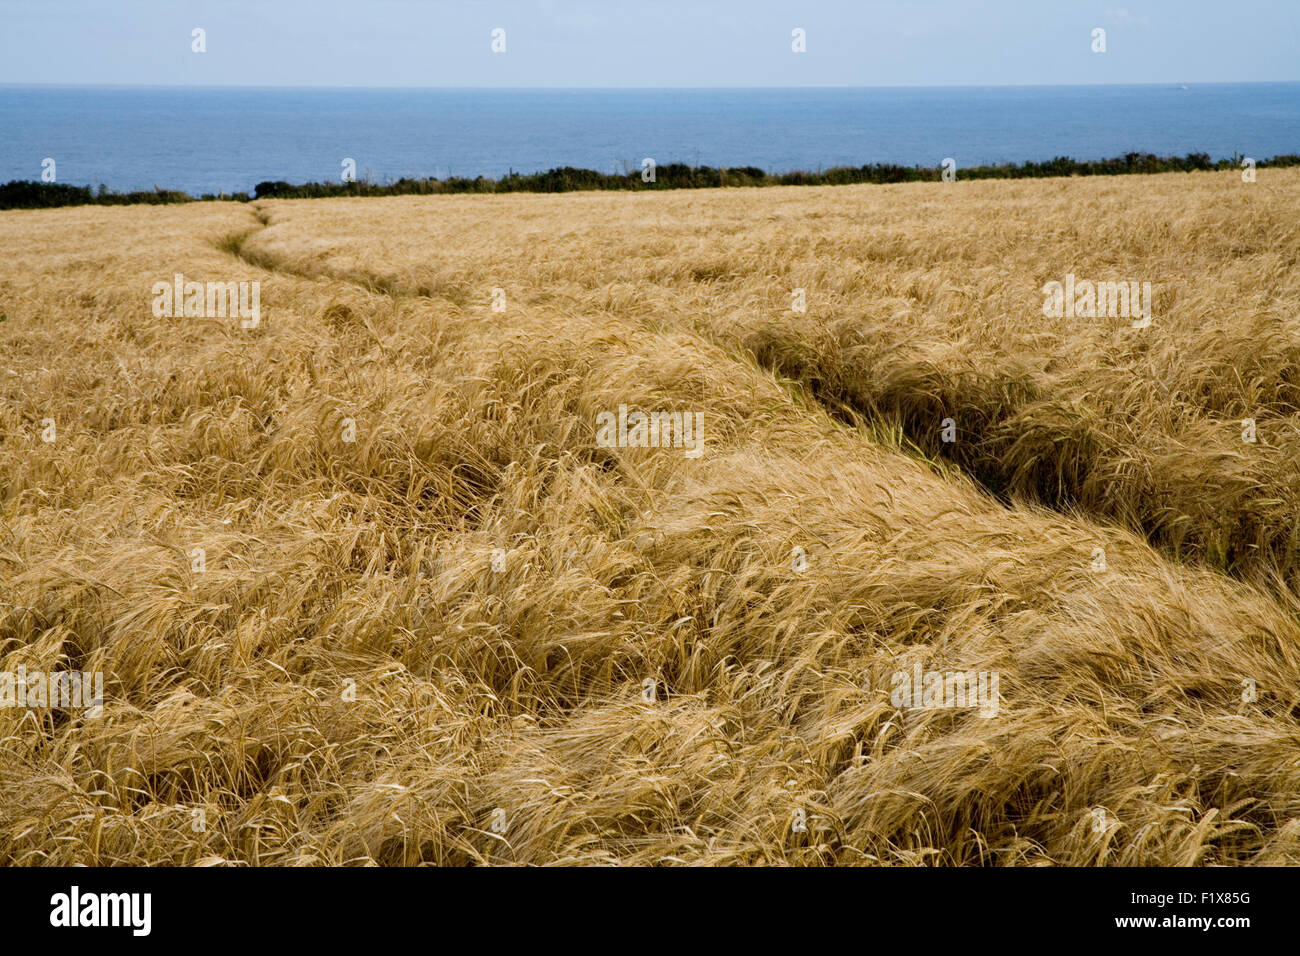 Path through Wheat field - Stock Image